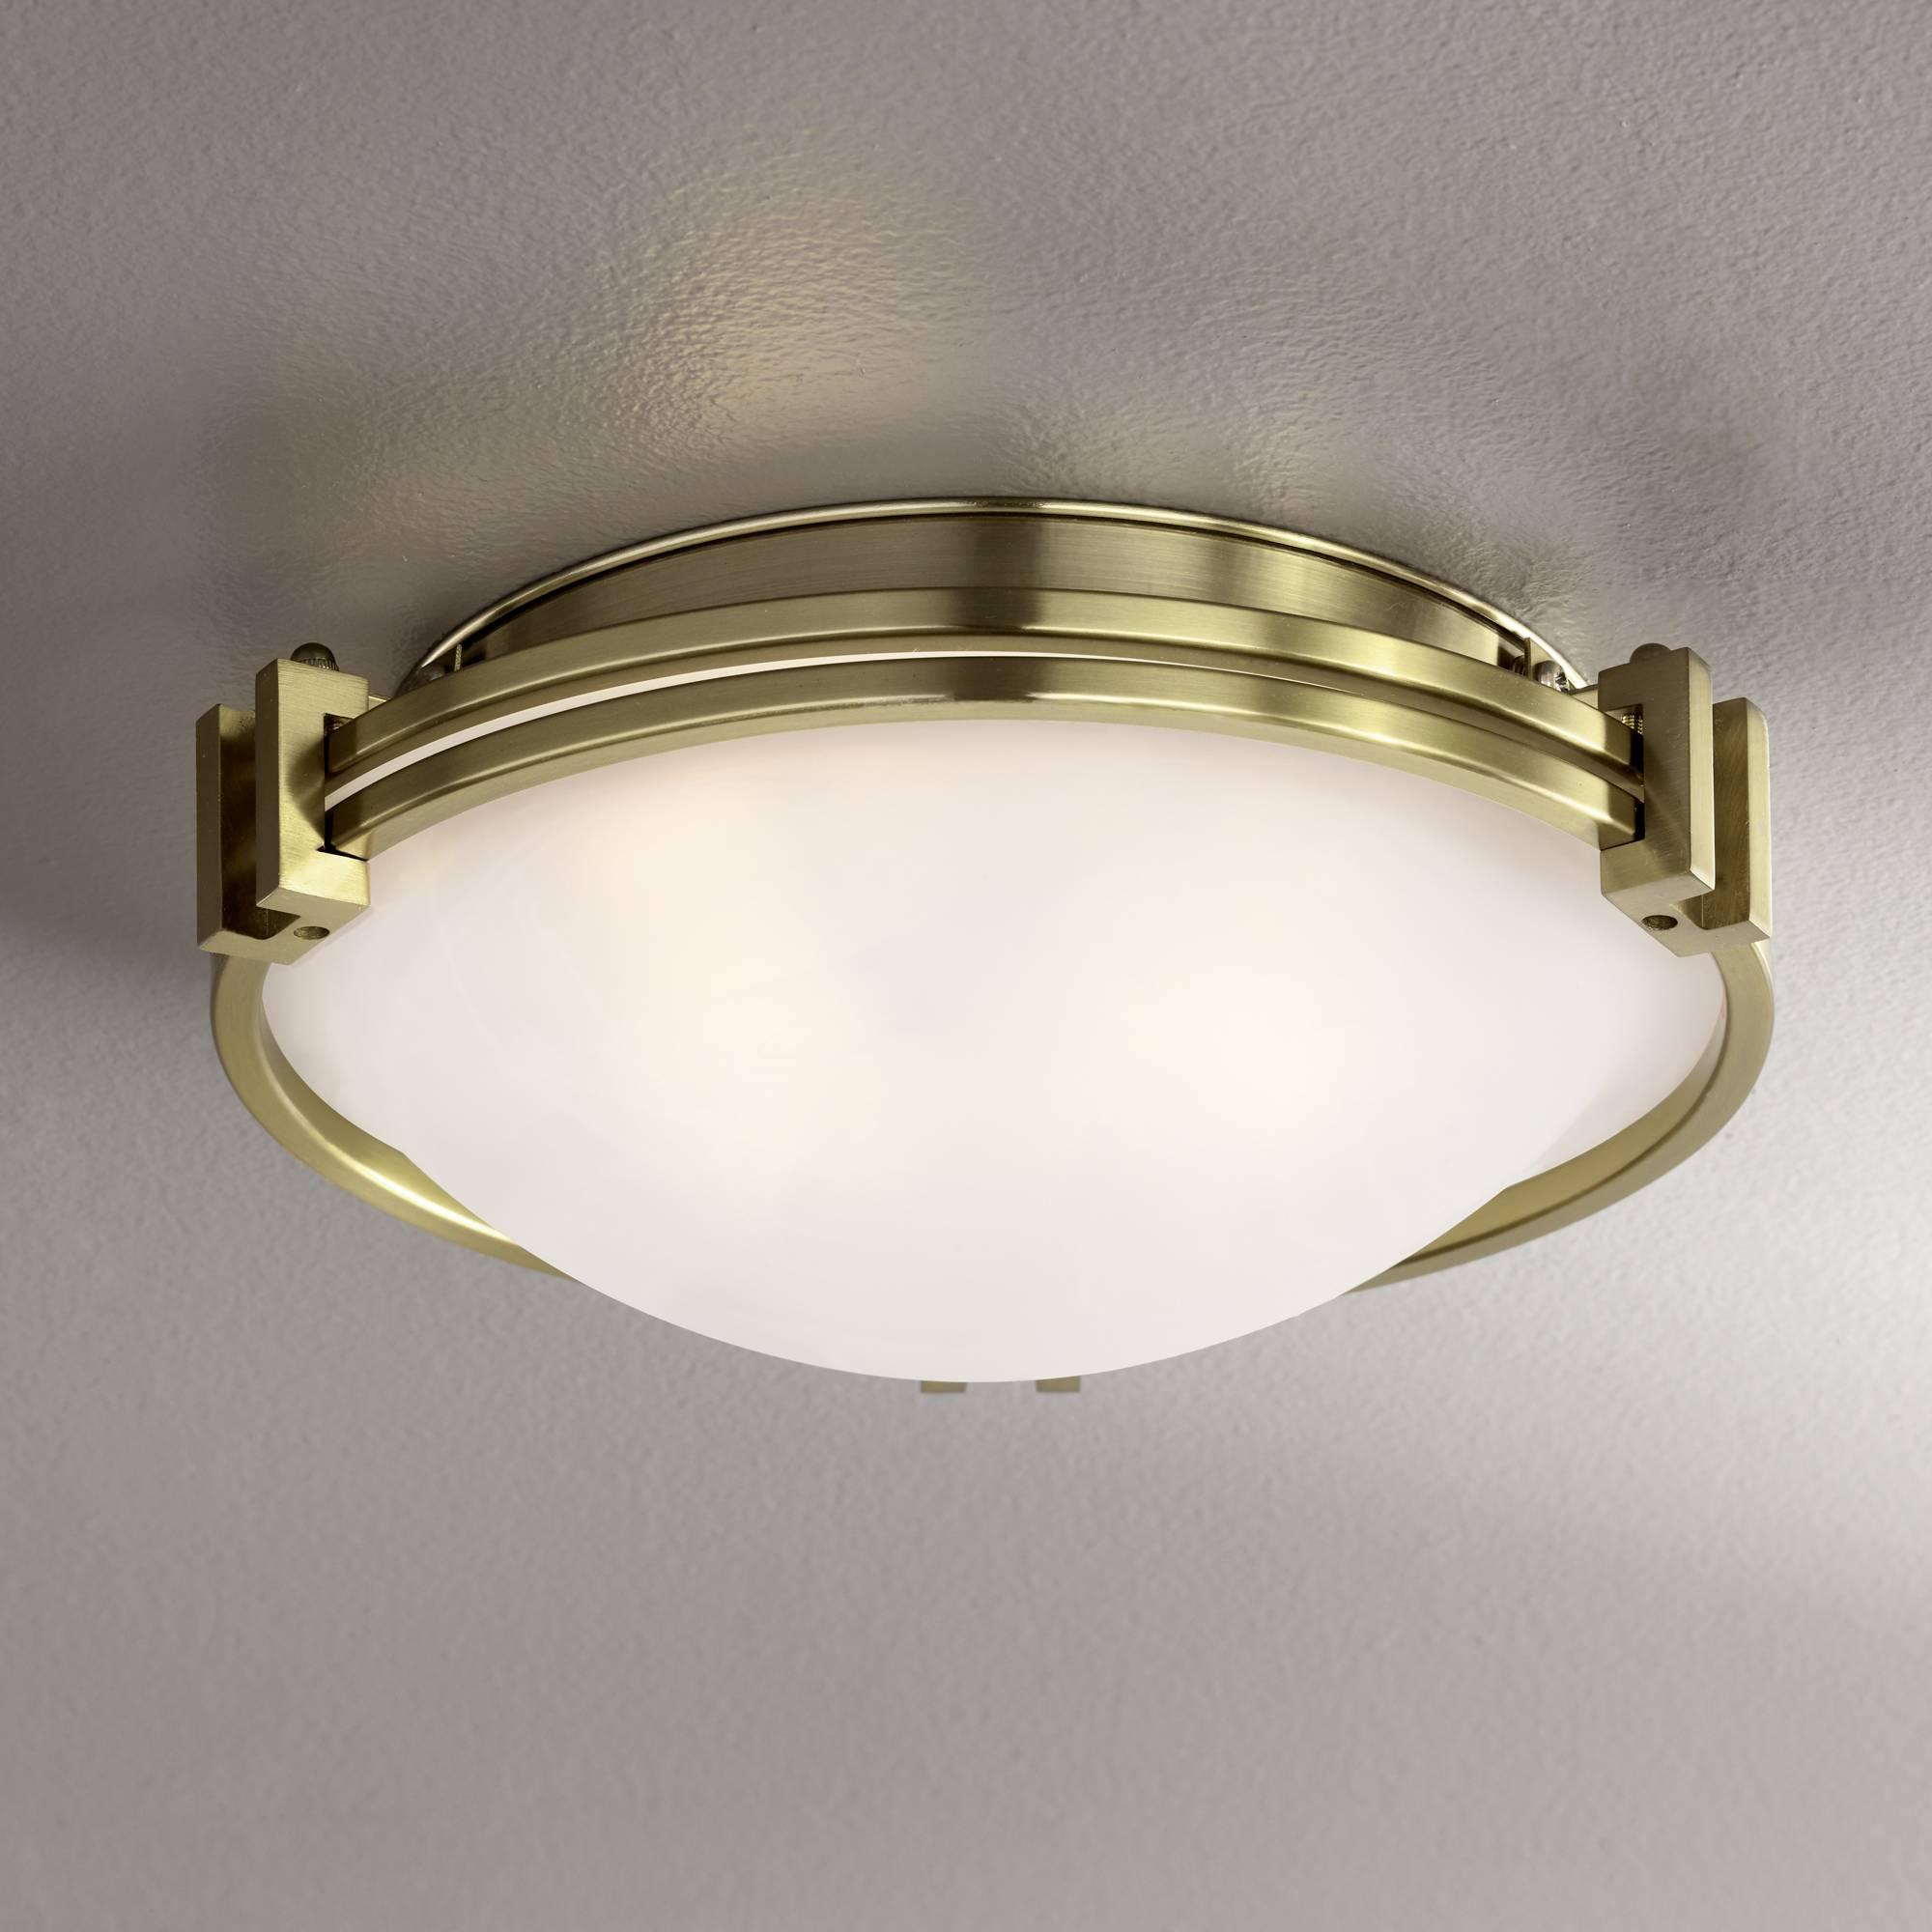 Details about Art Deco Ceiling Light Flush Mount Fixture Brass 12 3/4\